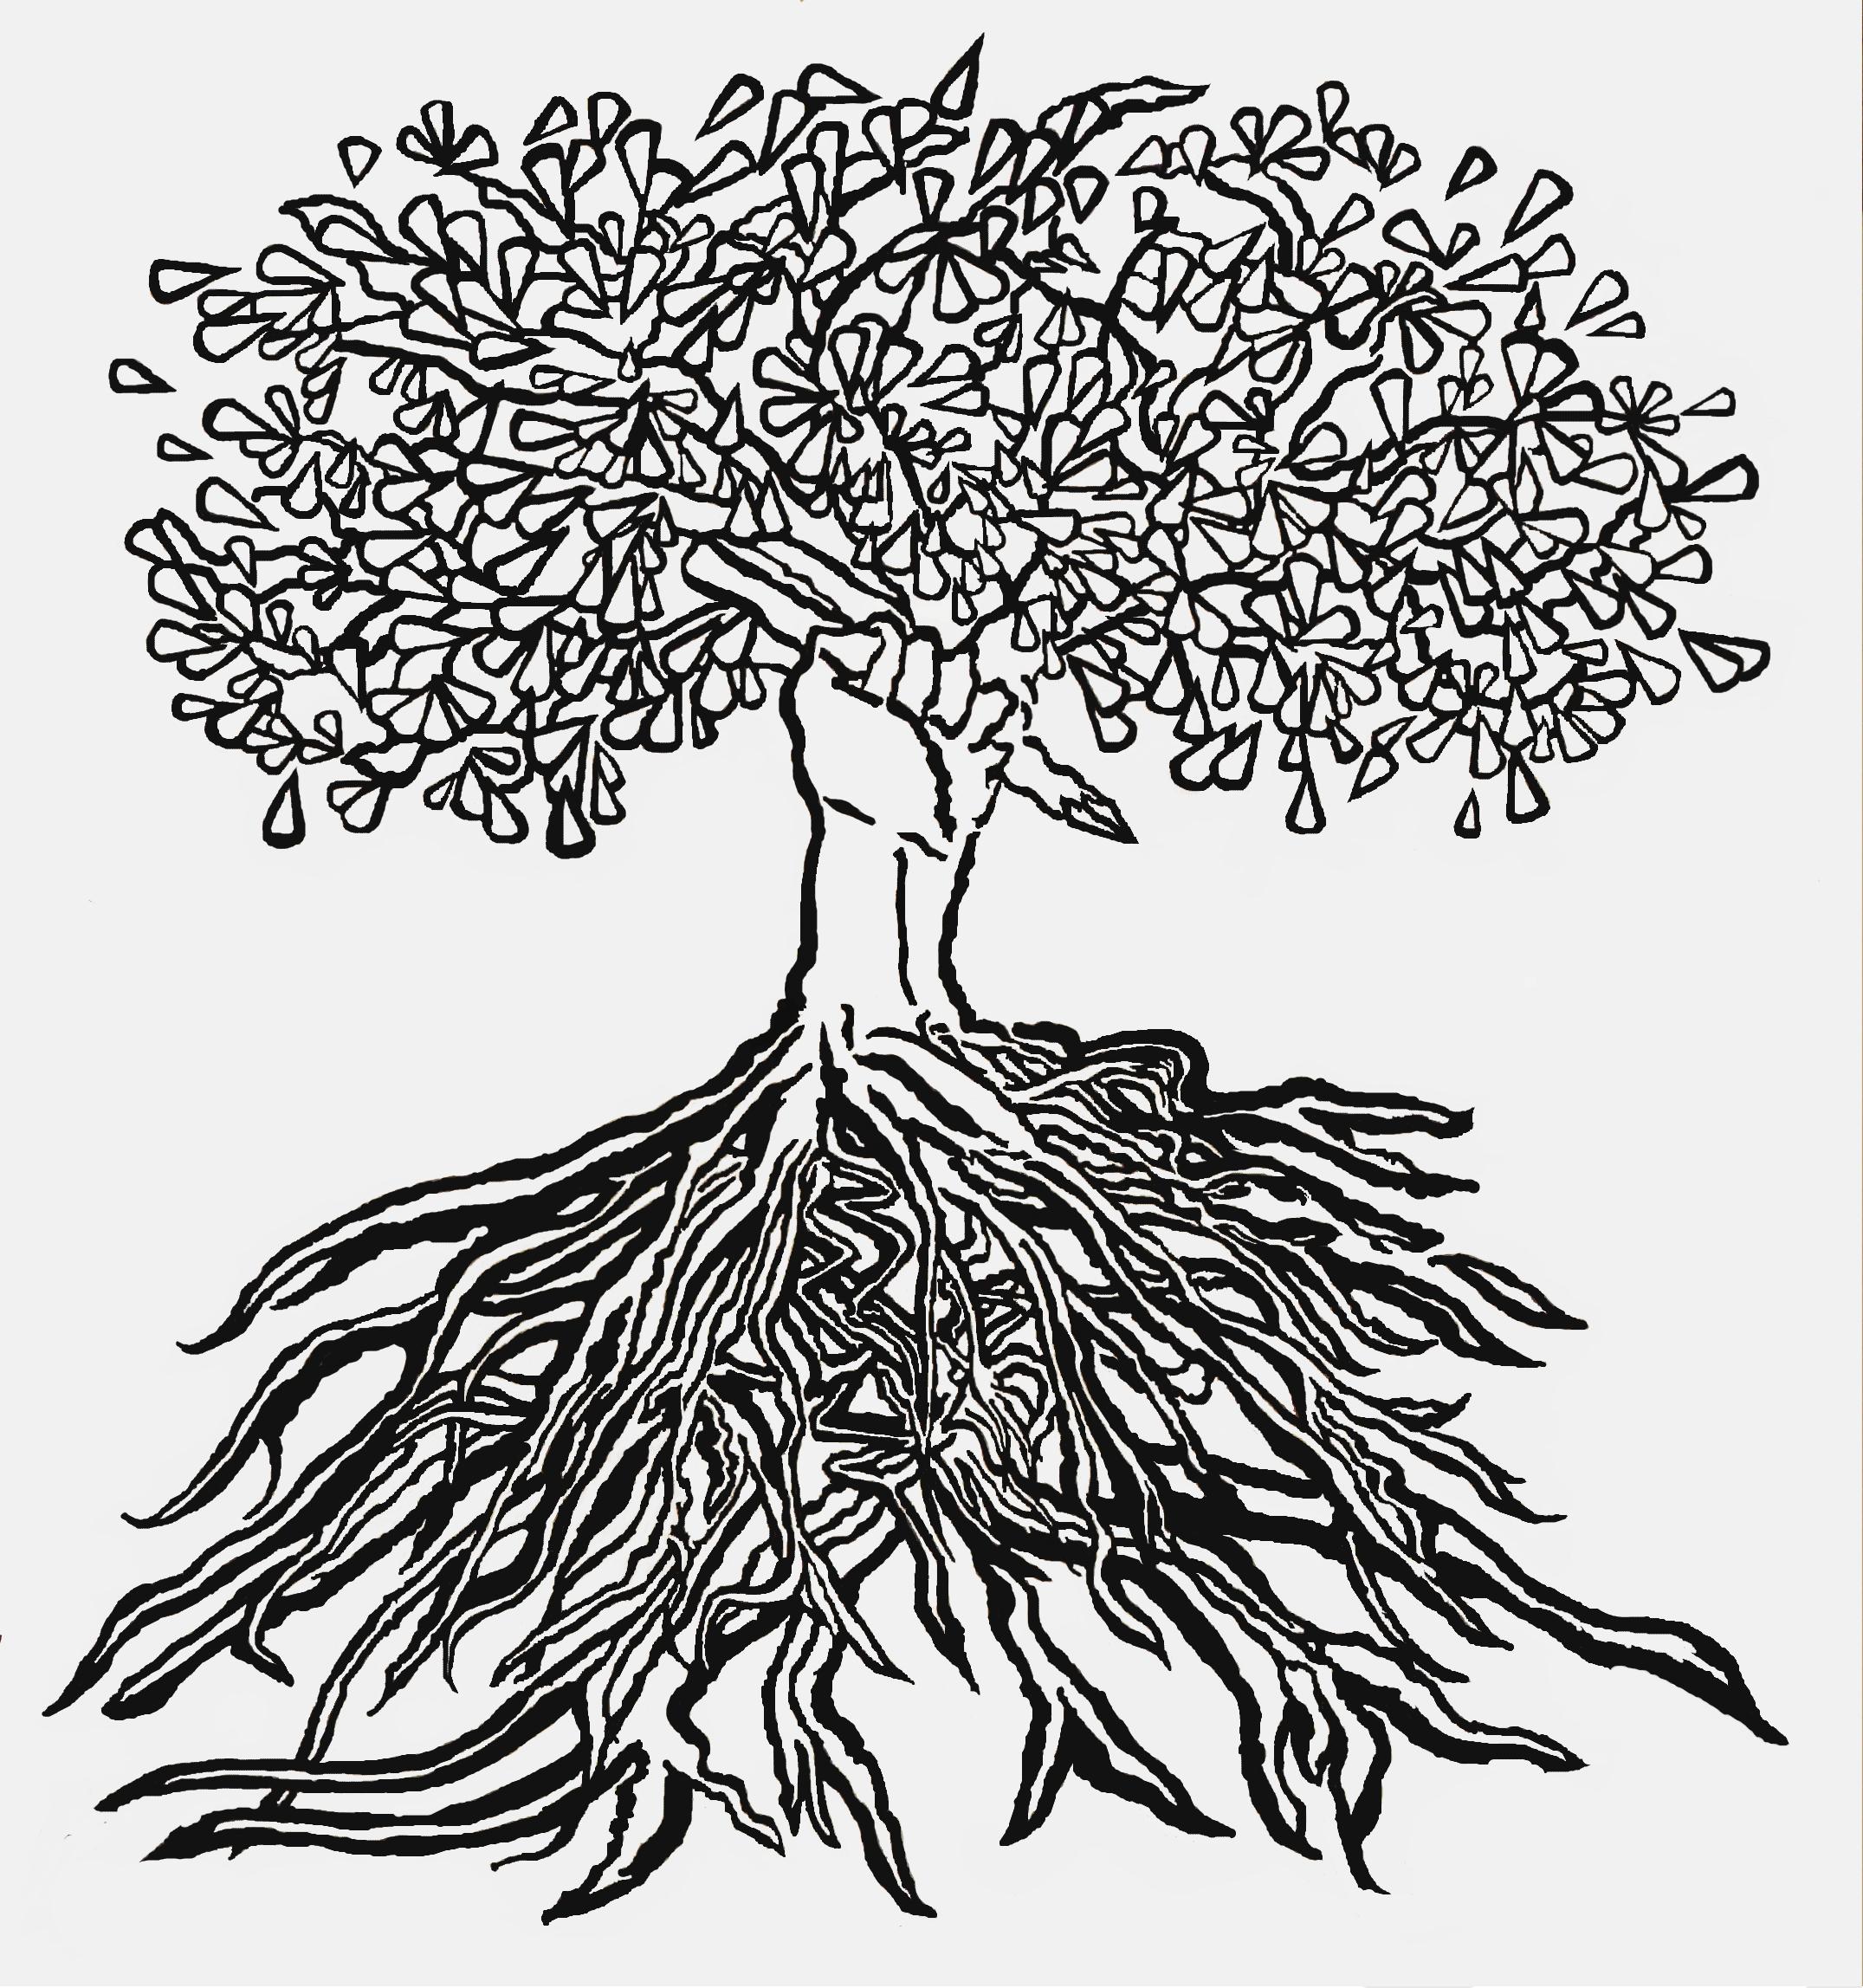 roots_5x6-9-14.jpg